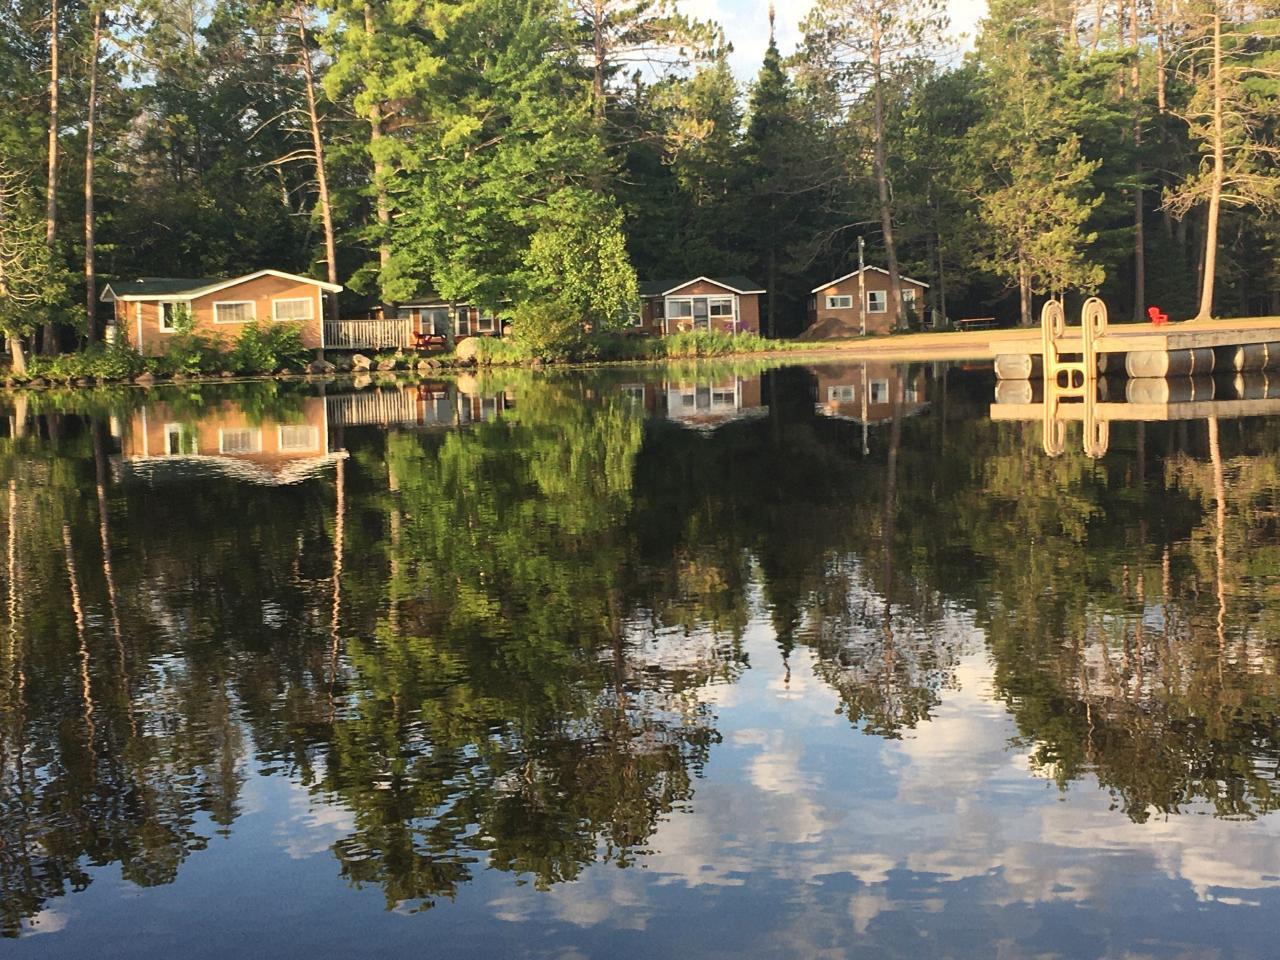 Lakeside Cabins